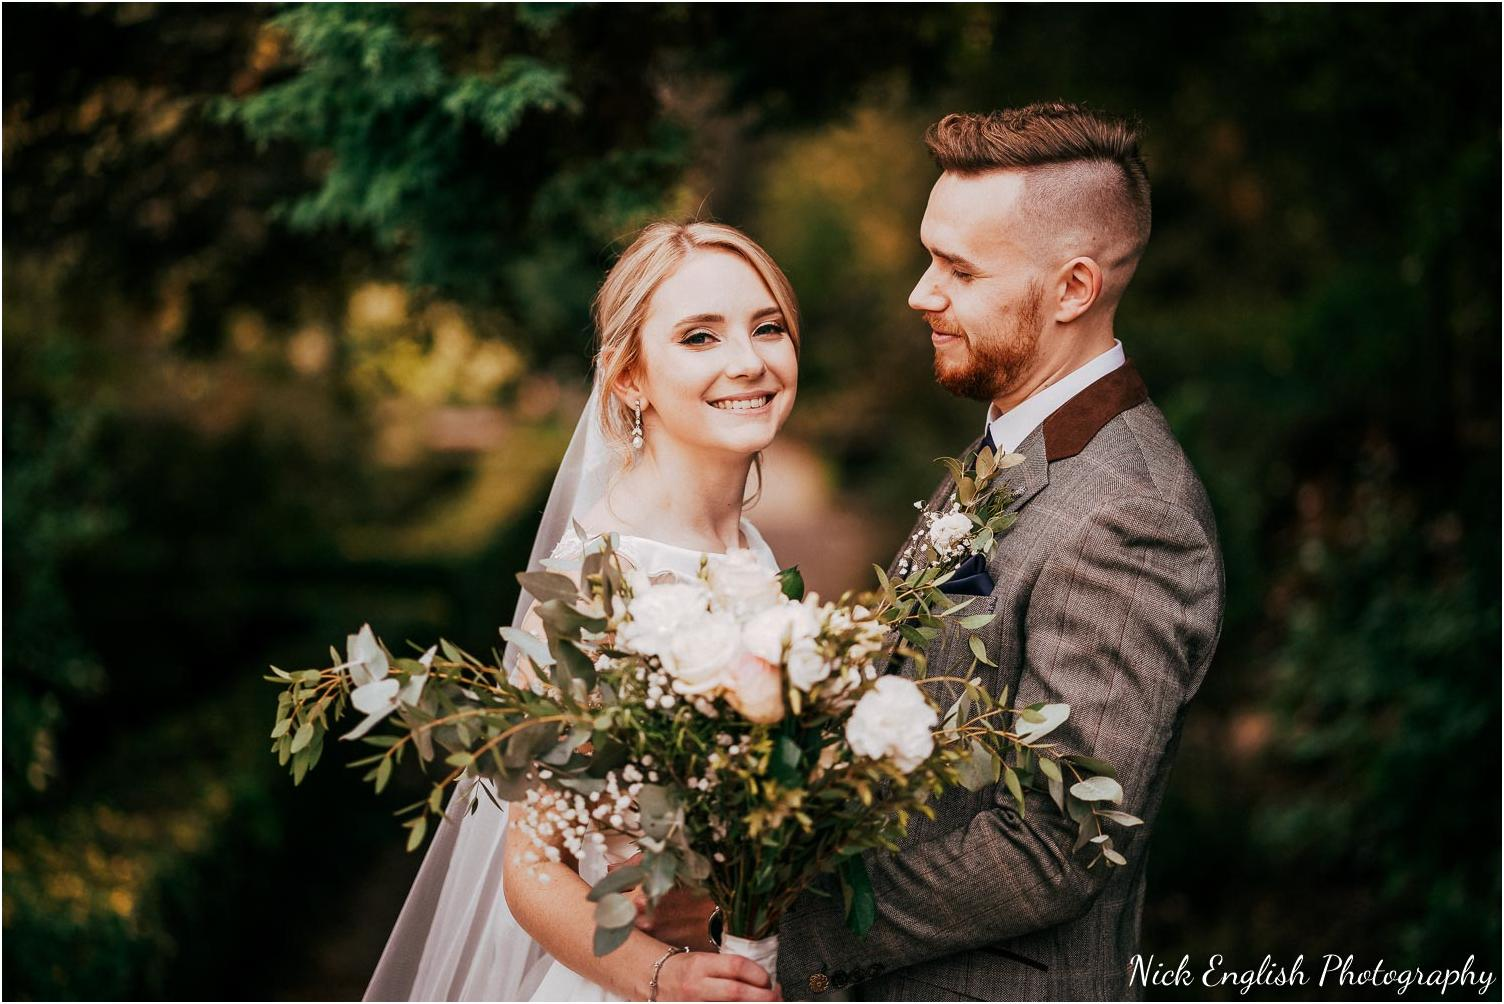 Eaves_Hall_Outdoor_Wedding_Photograph-54.jpg